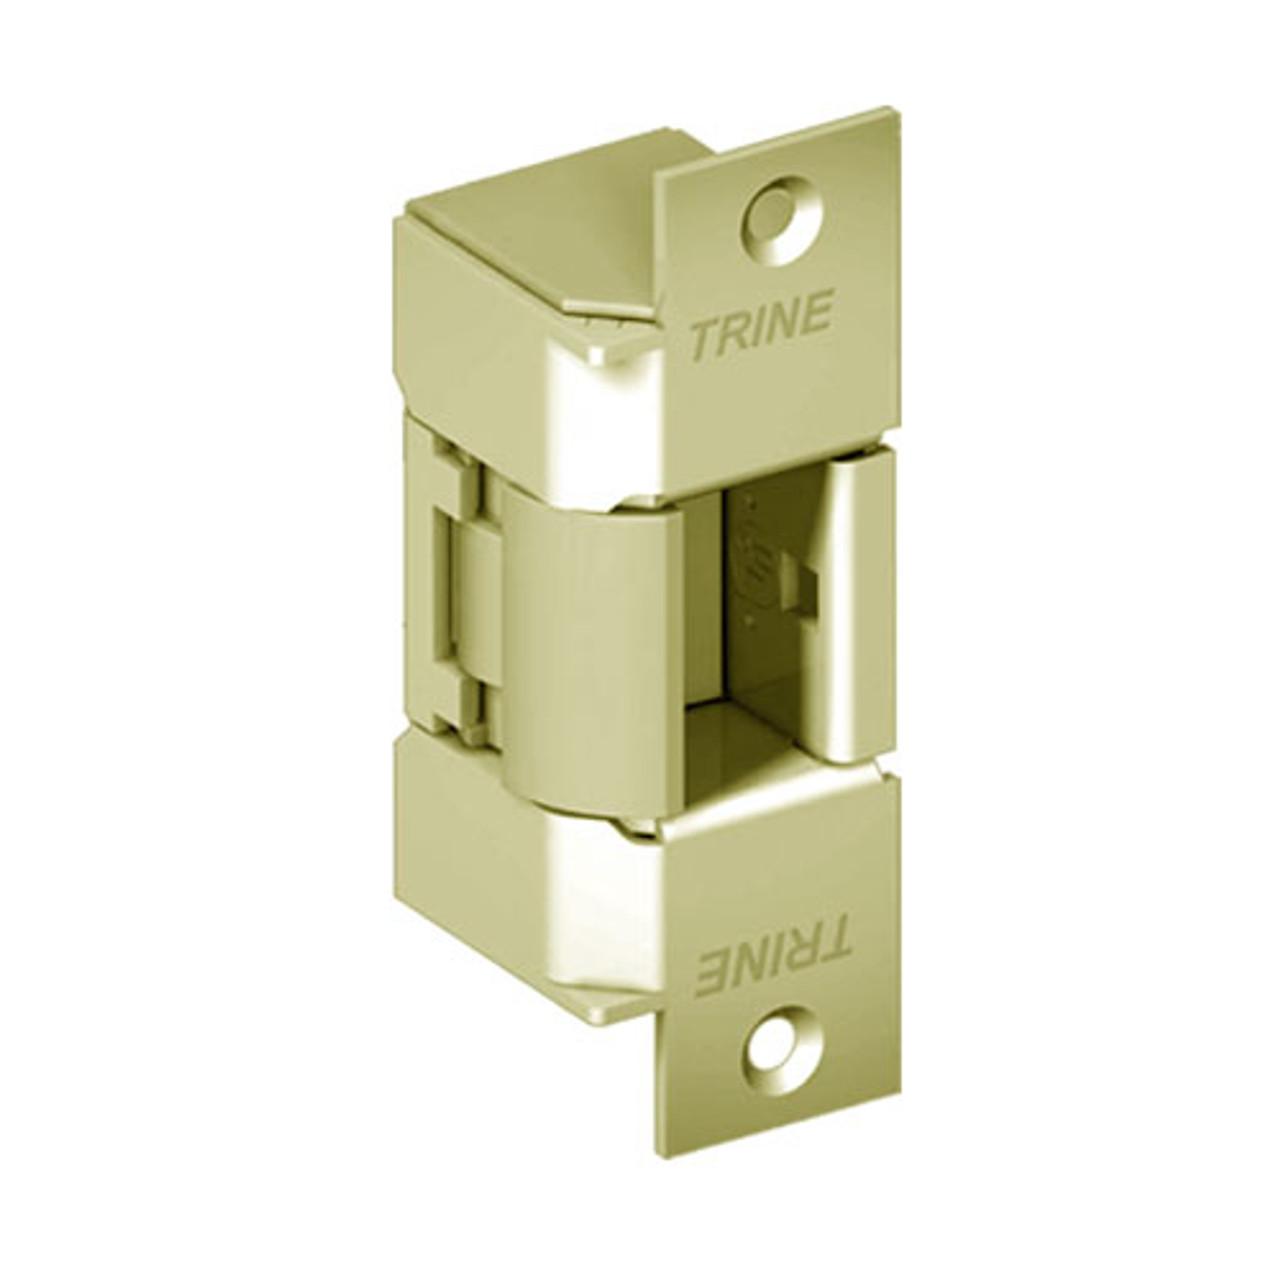 EN400-12DC-US4-LH Trine EN Series Outdoor Electric Strikes Solution in Satin Brass Finish